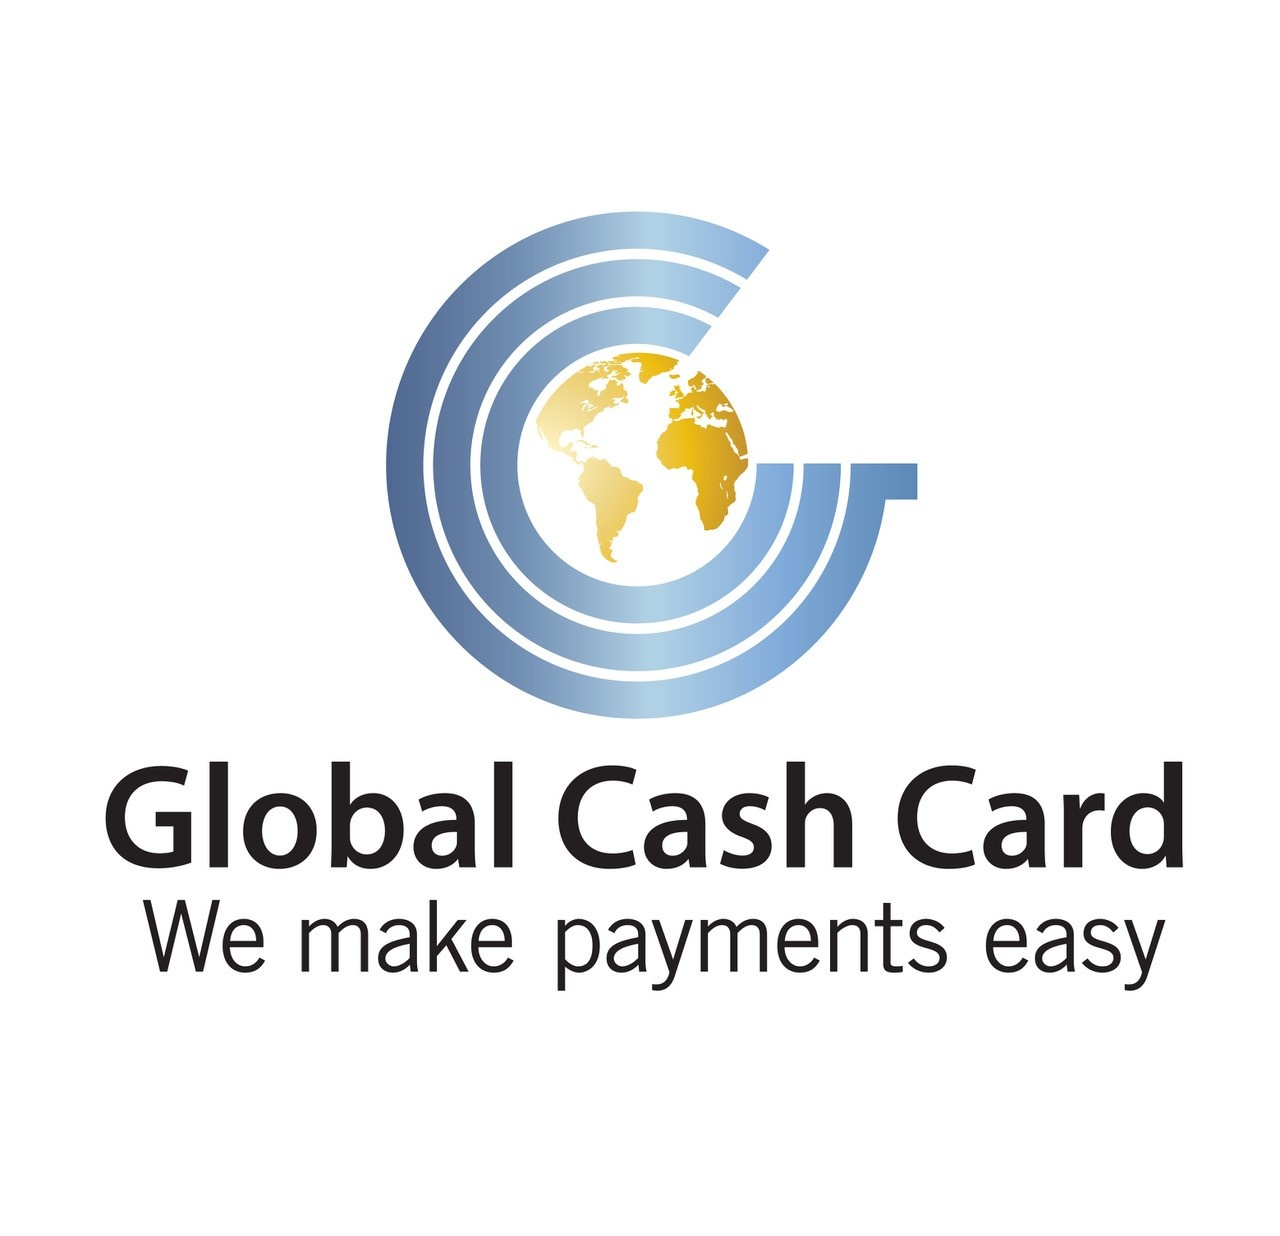 Global-Cash-Card_2017-1.jpg